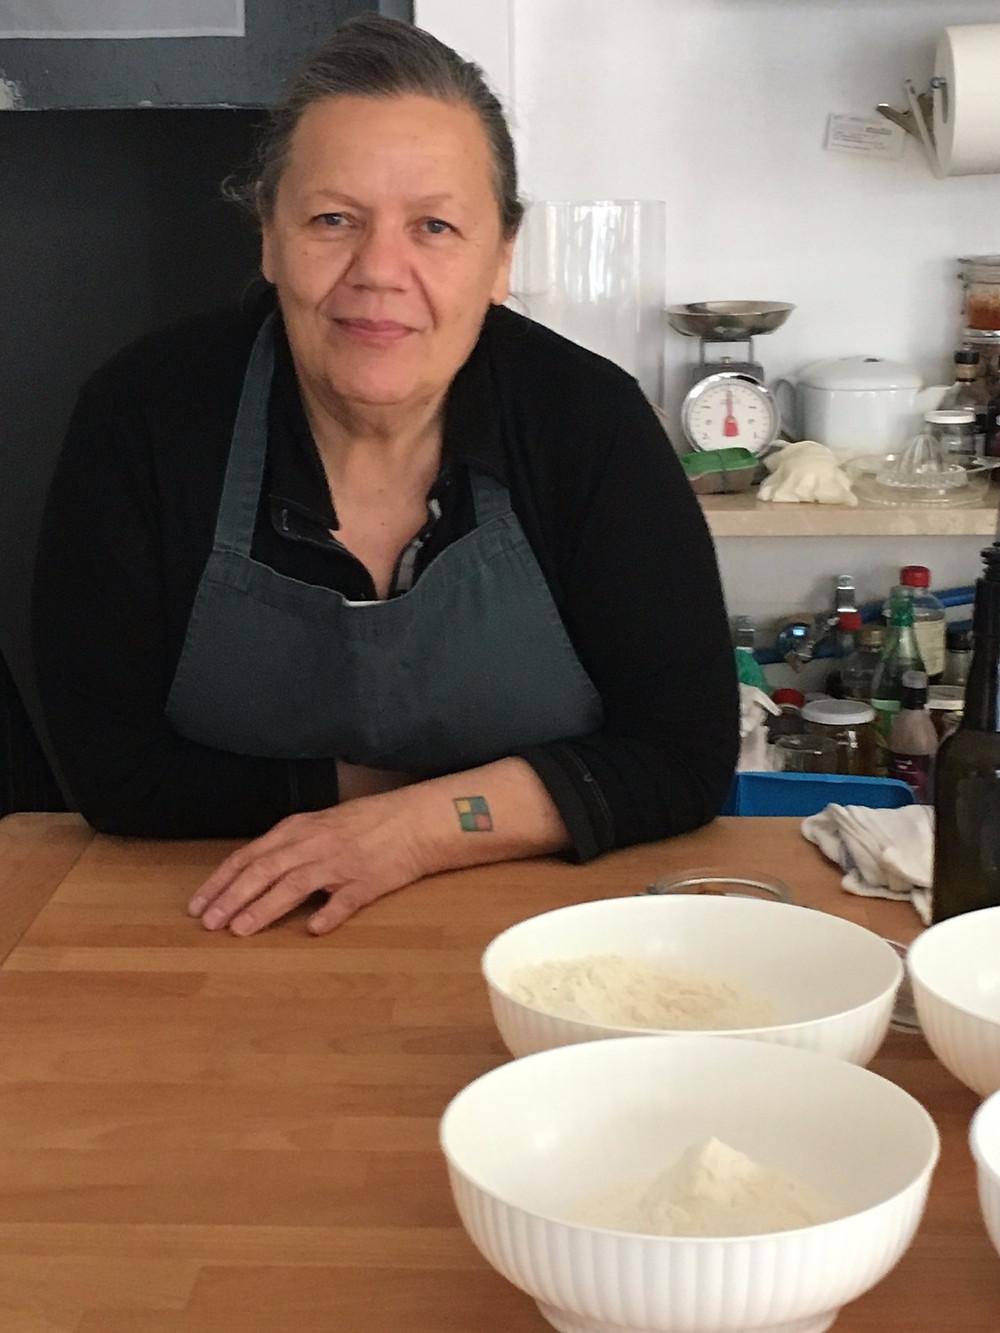 Carla Tomasi, cooking instructor, gardener